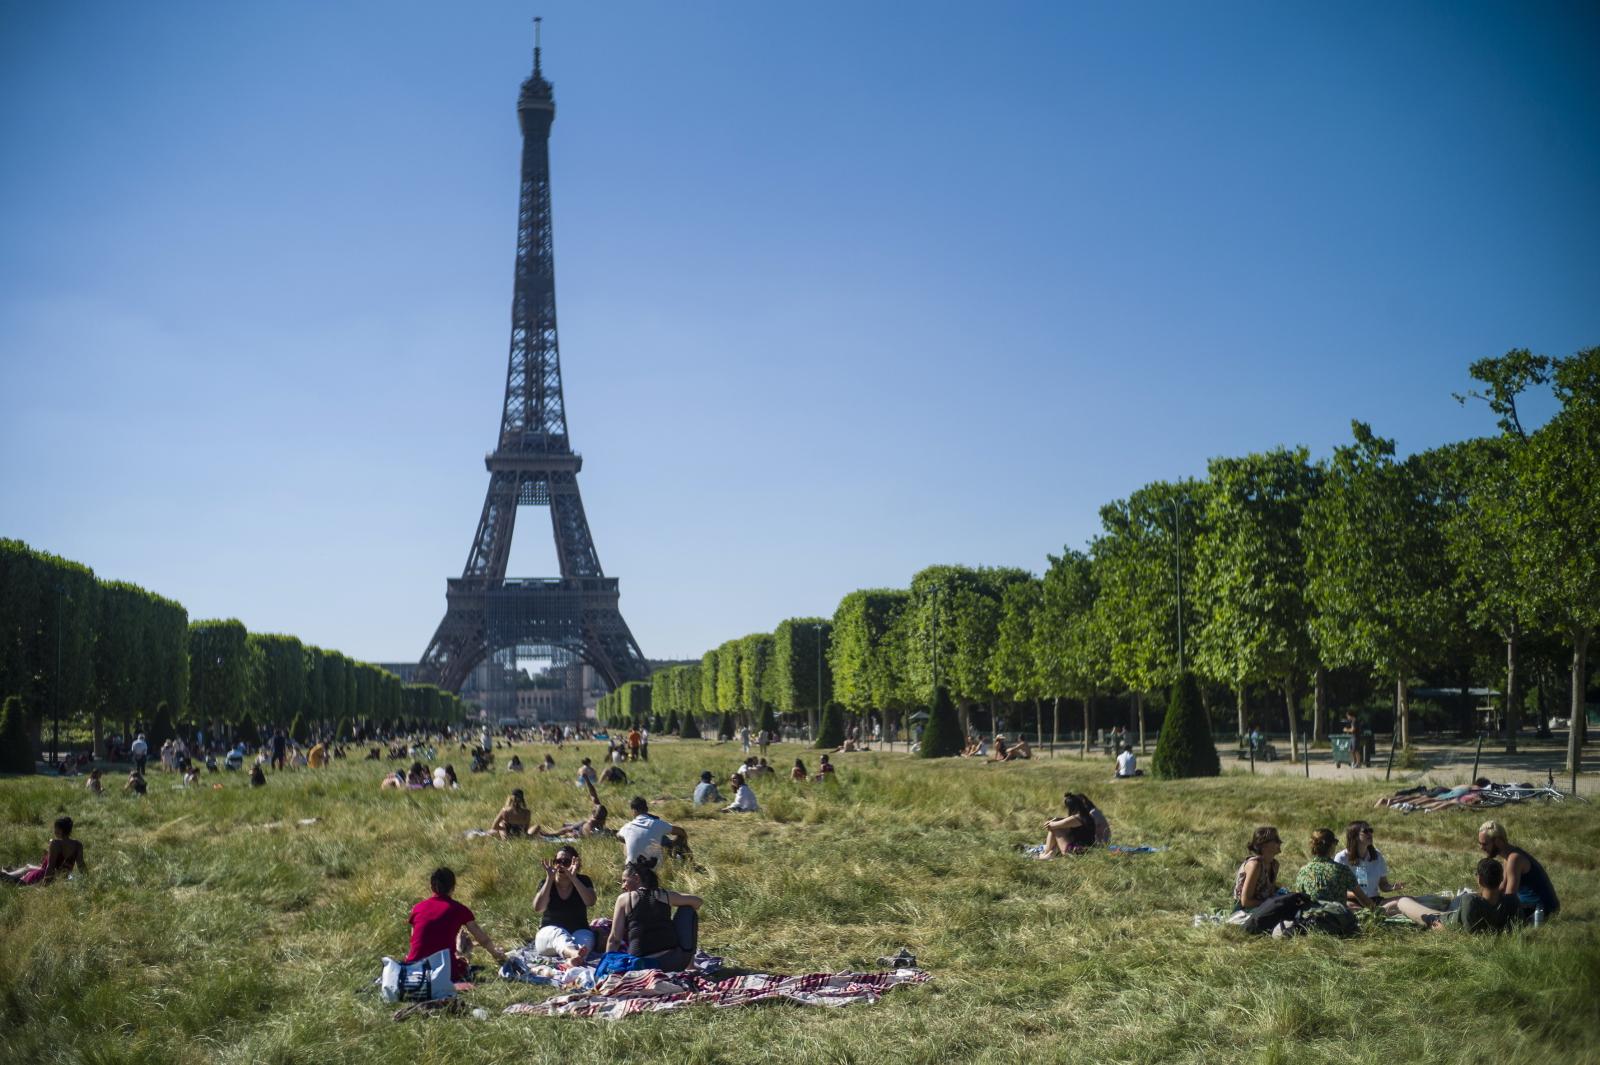 Dzień w Paryżu fot. EPA/YOAN VALAT